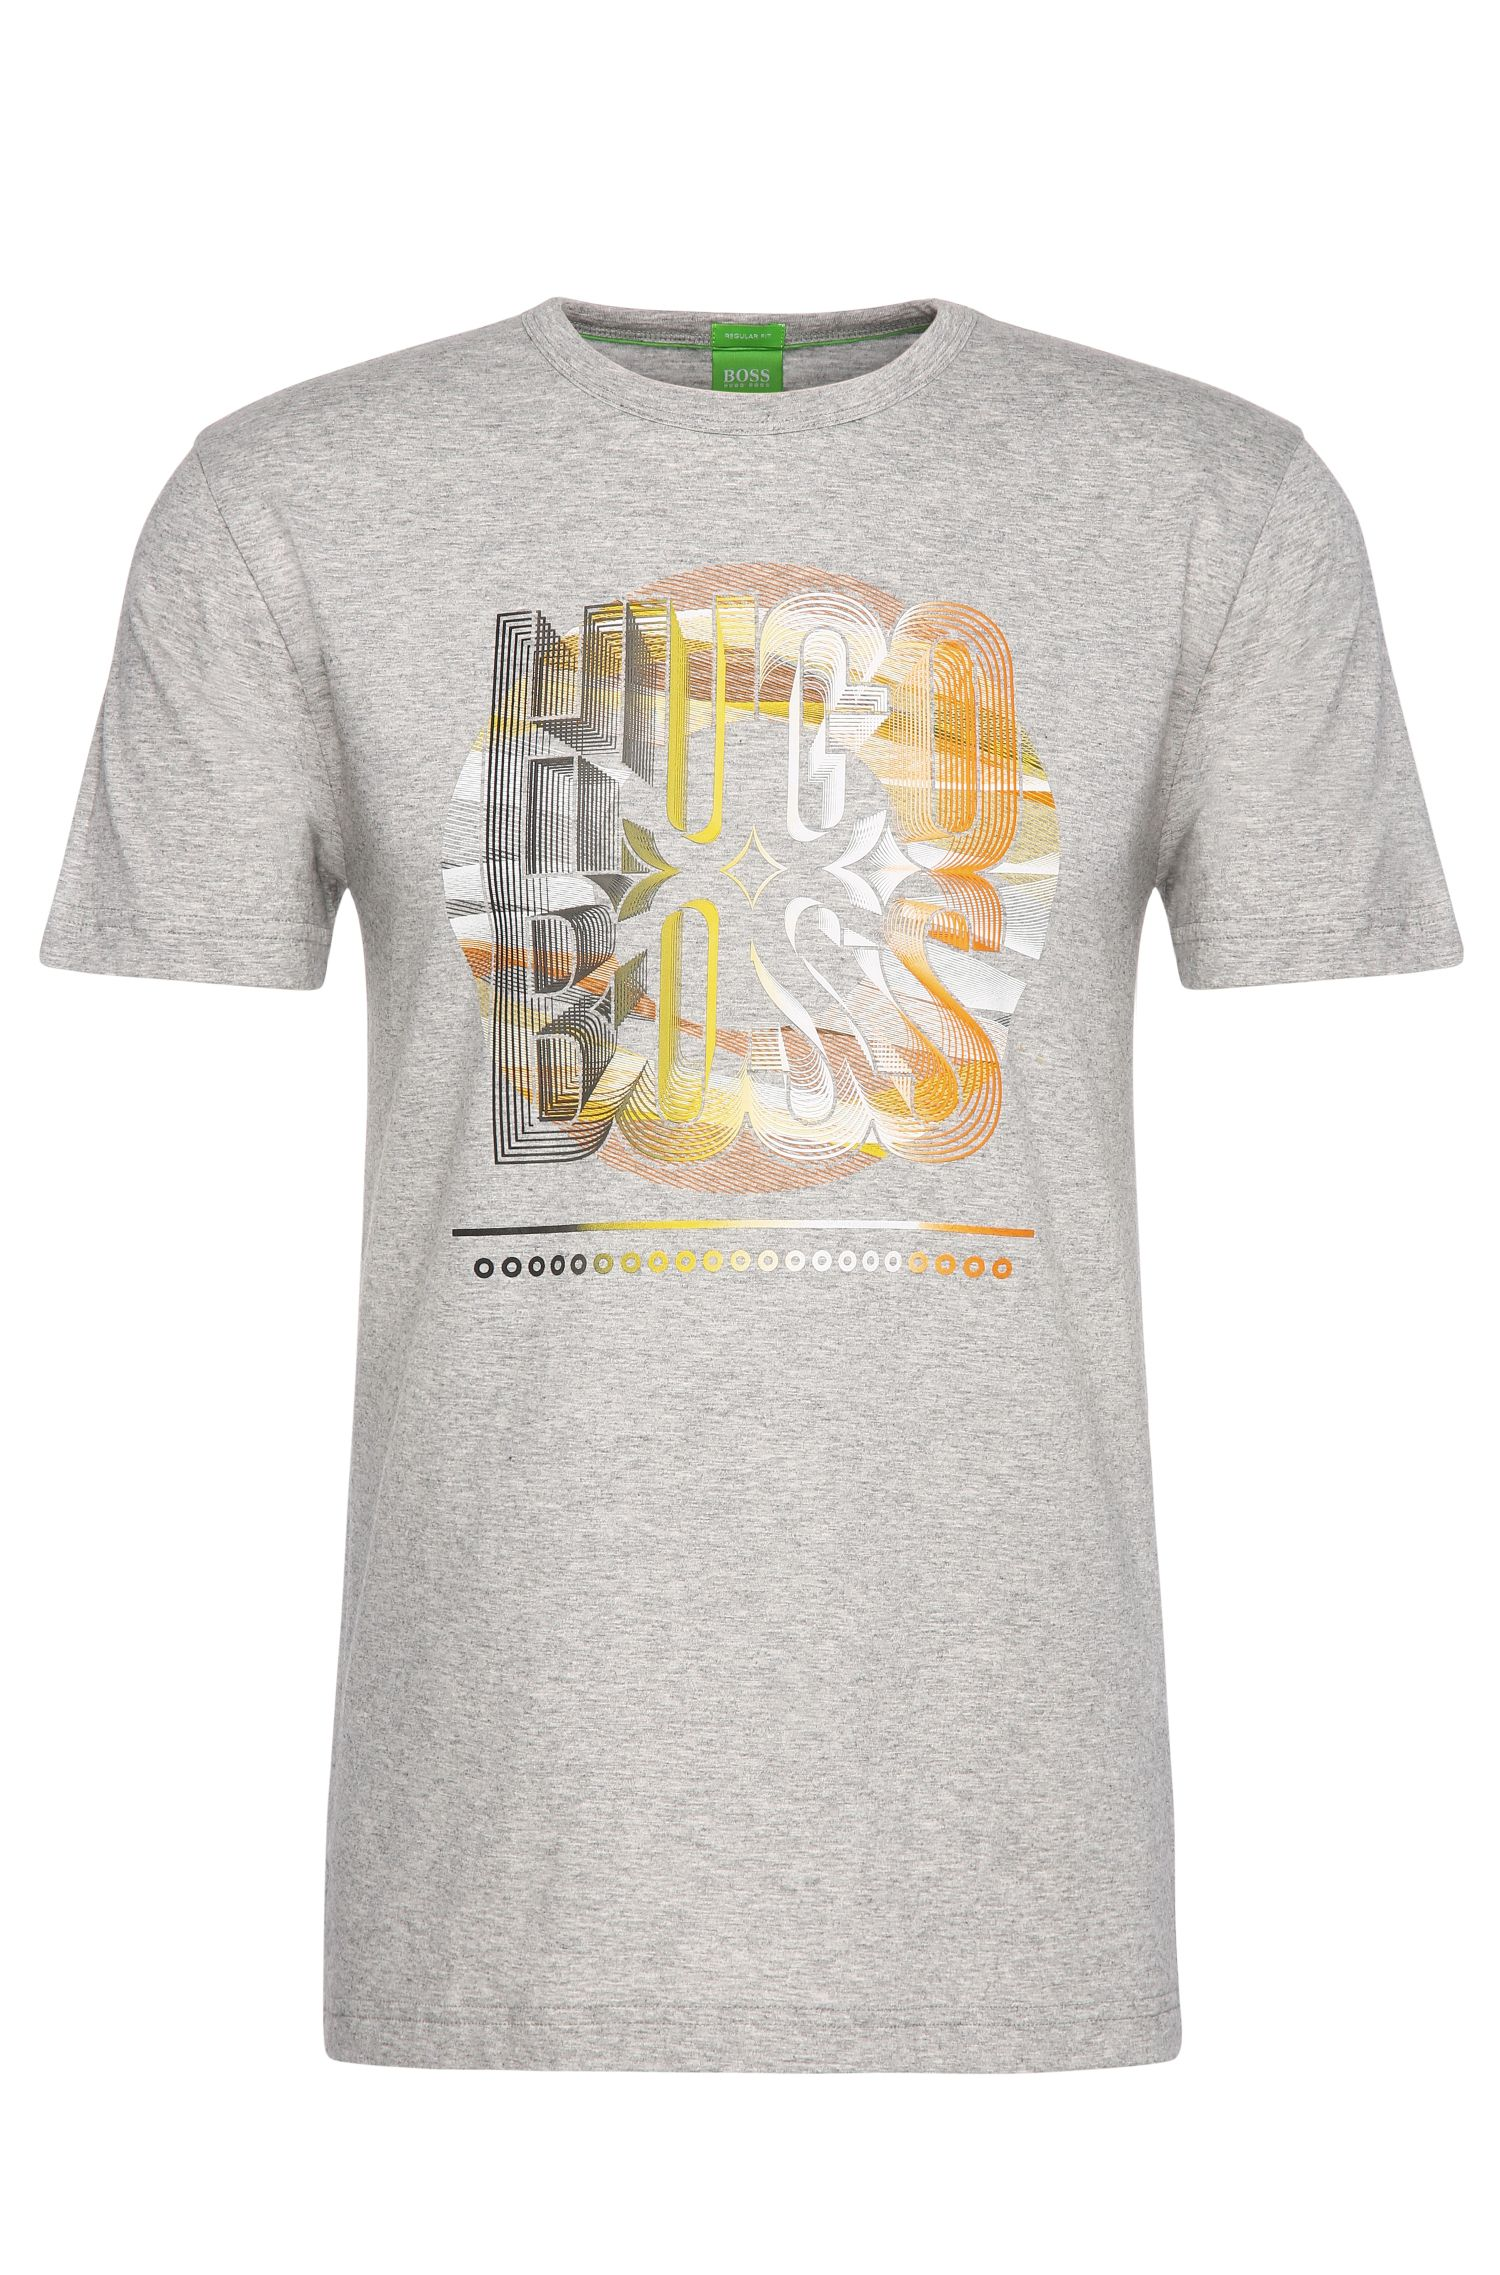 Regular-Fit Baumwollshirt mit Print: ´Tee 3`